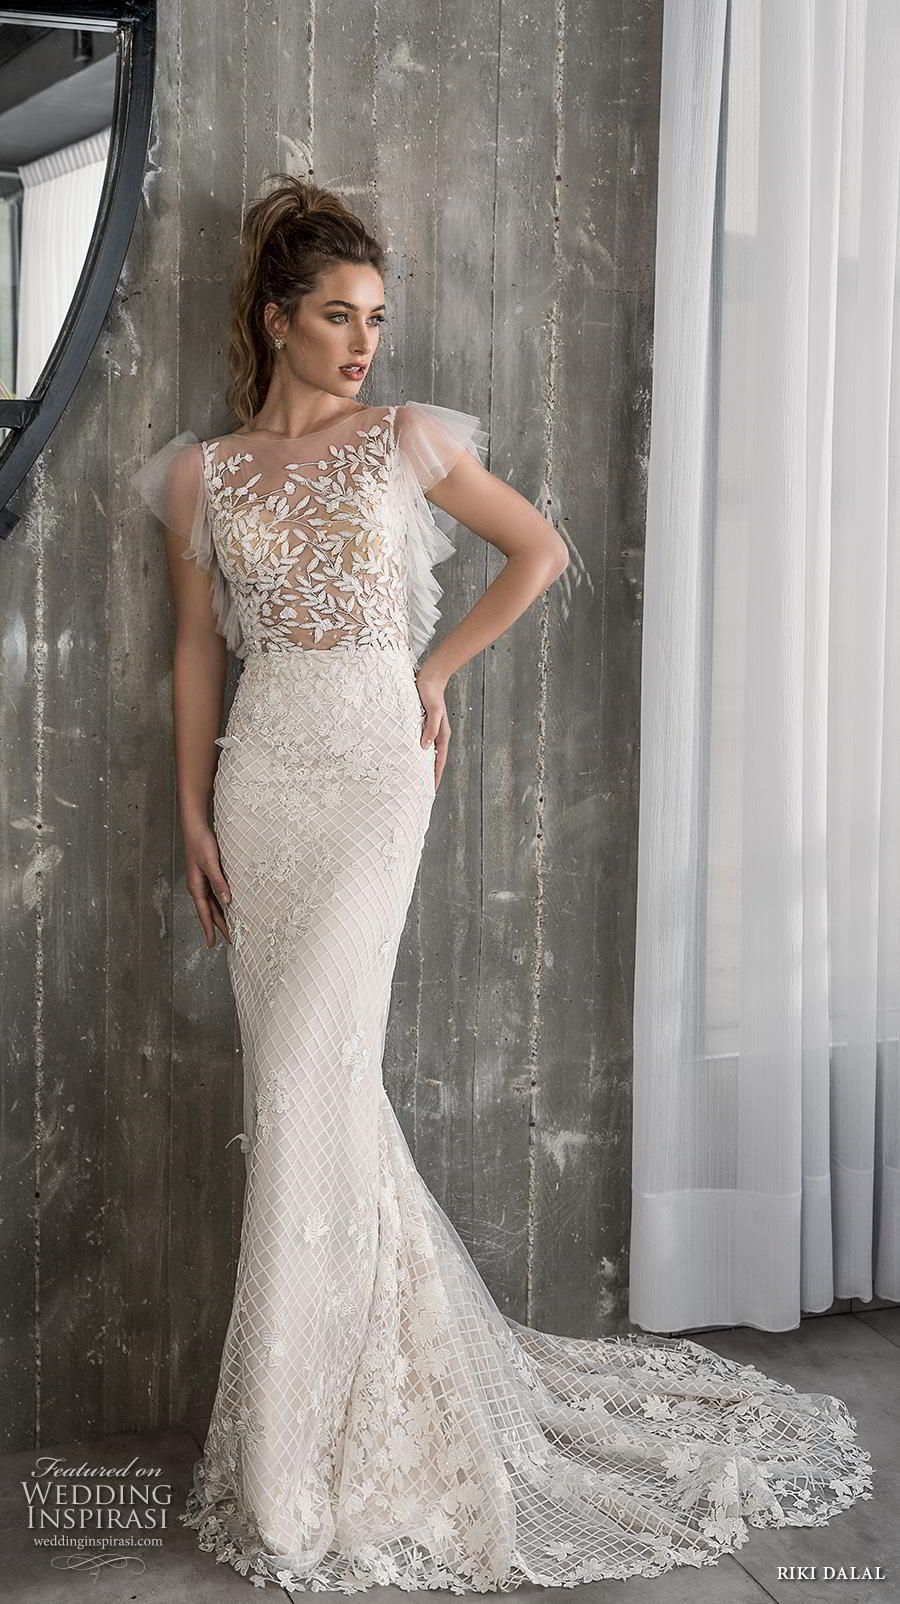 54814c5a07 riki dalal 2018 glamour bridal cap sleeves illusion bateau neck full  embellishment romantic fit and flare wedding dress sheer lace back short  train (3) mv ...